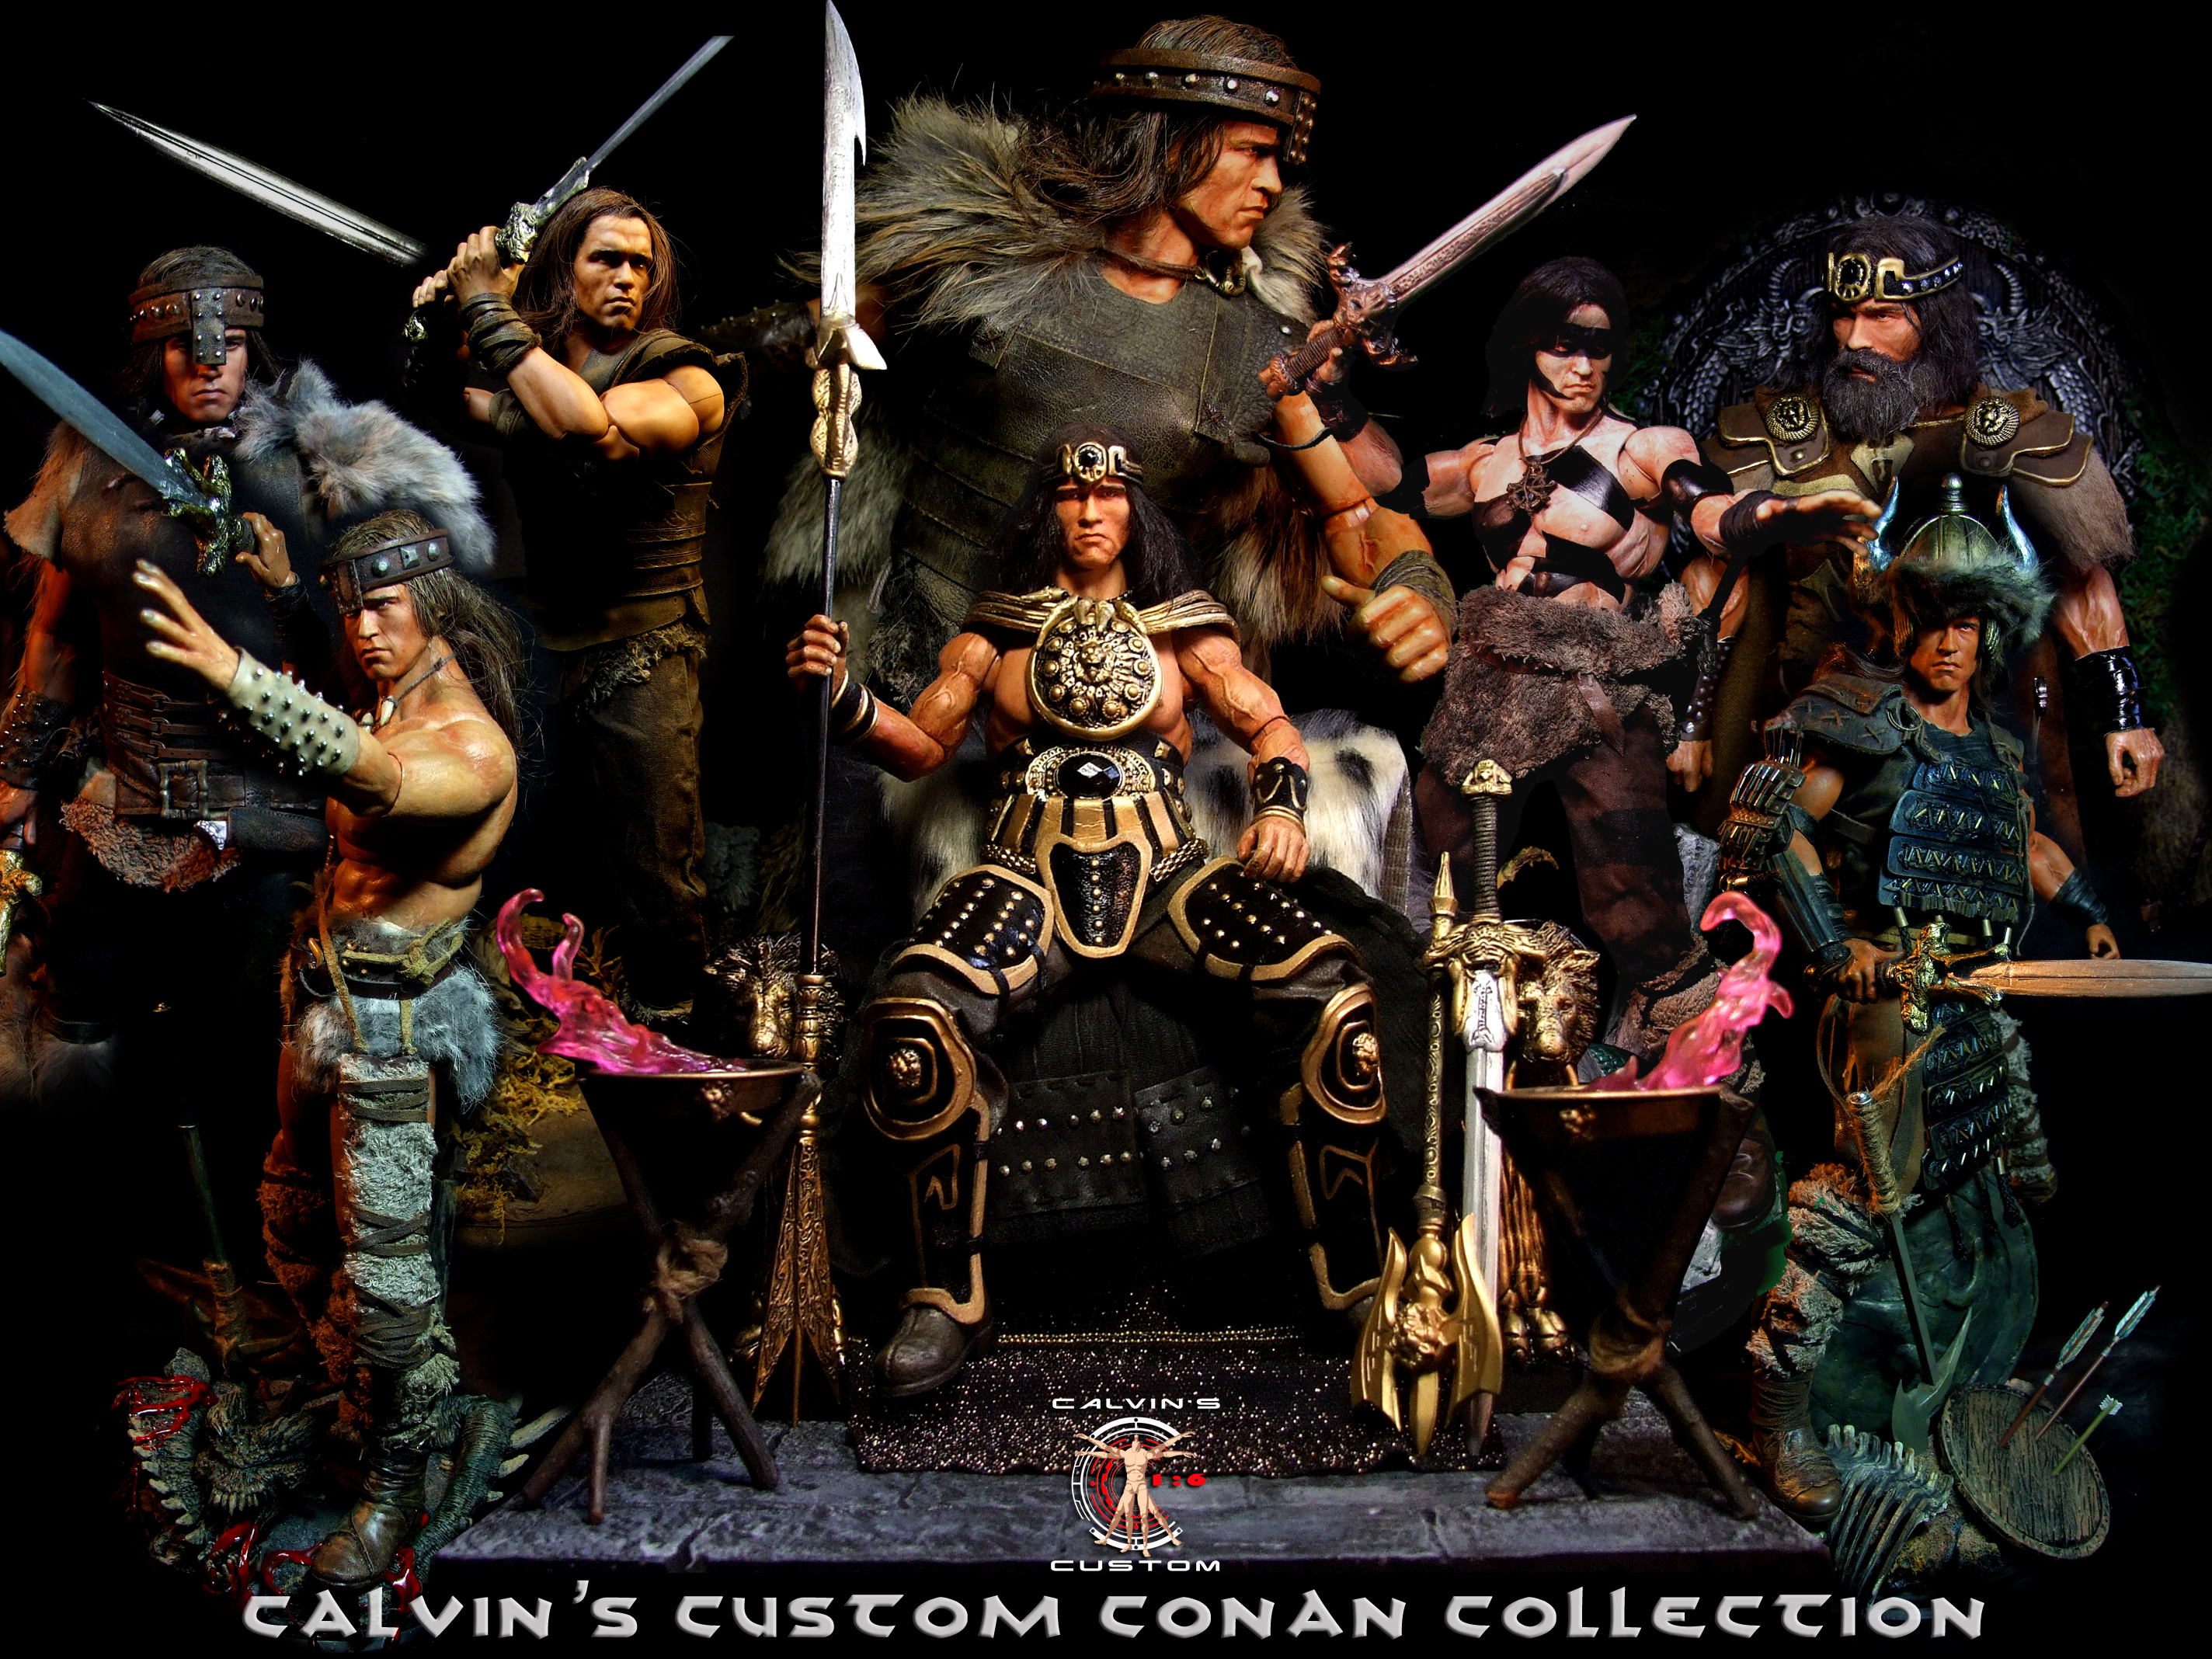 Calvin's Custom 1/6 one sixth scale Arnold Schwarzenegger as Conan the Barbarian and the destroyer a